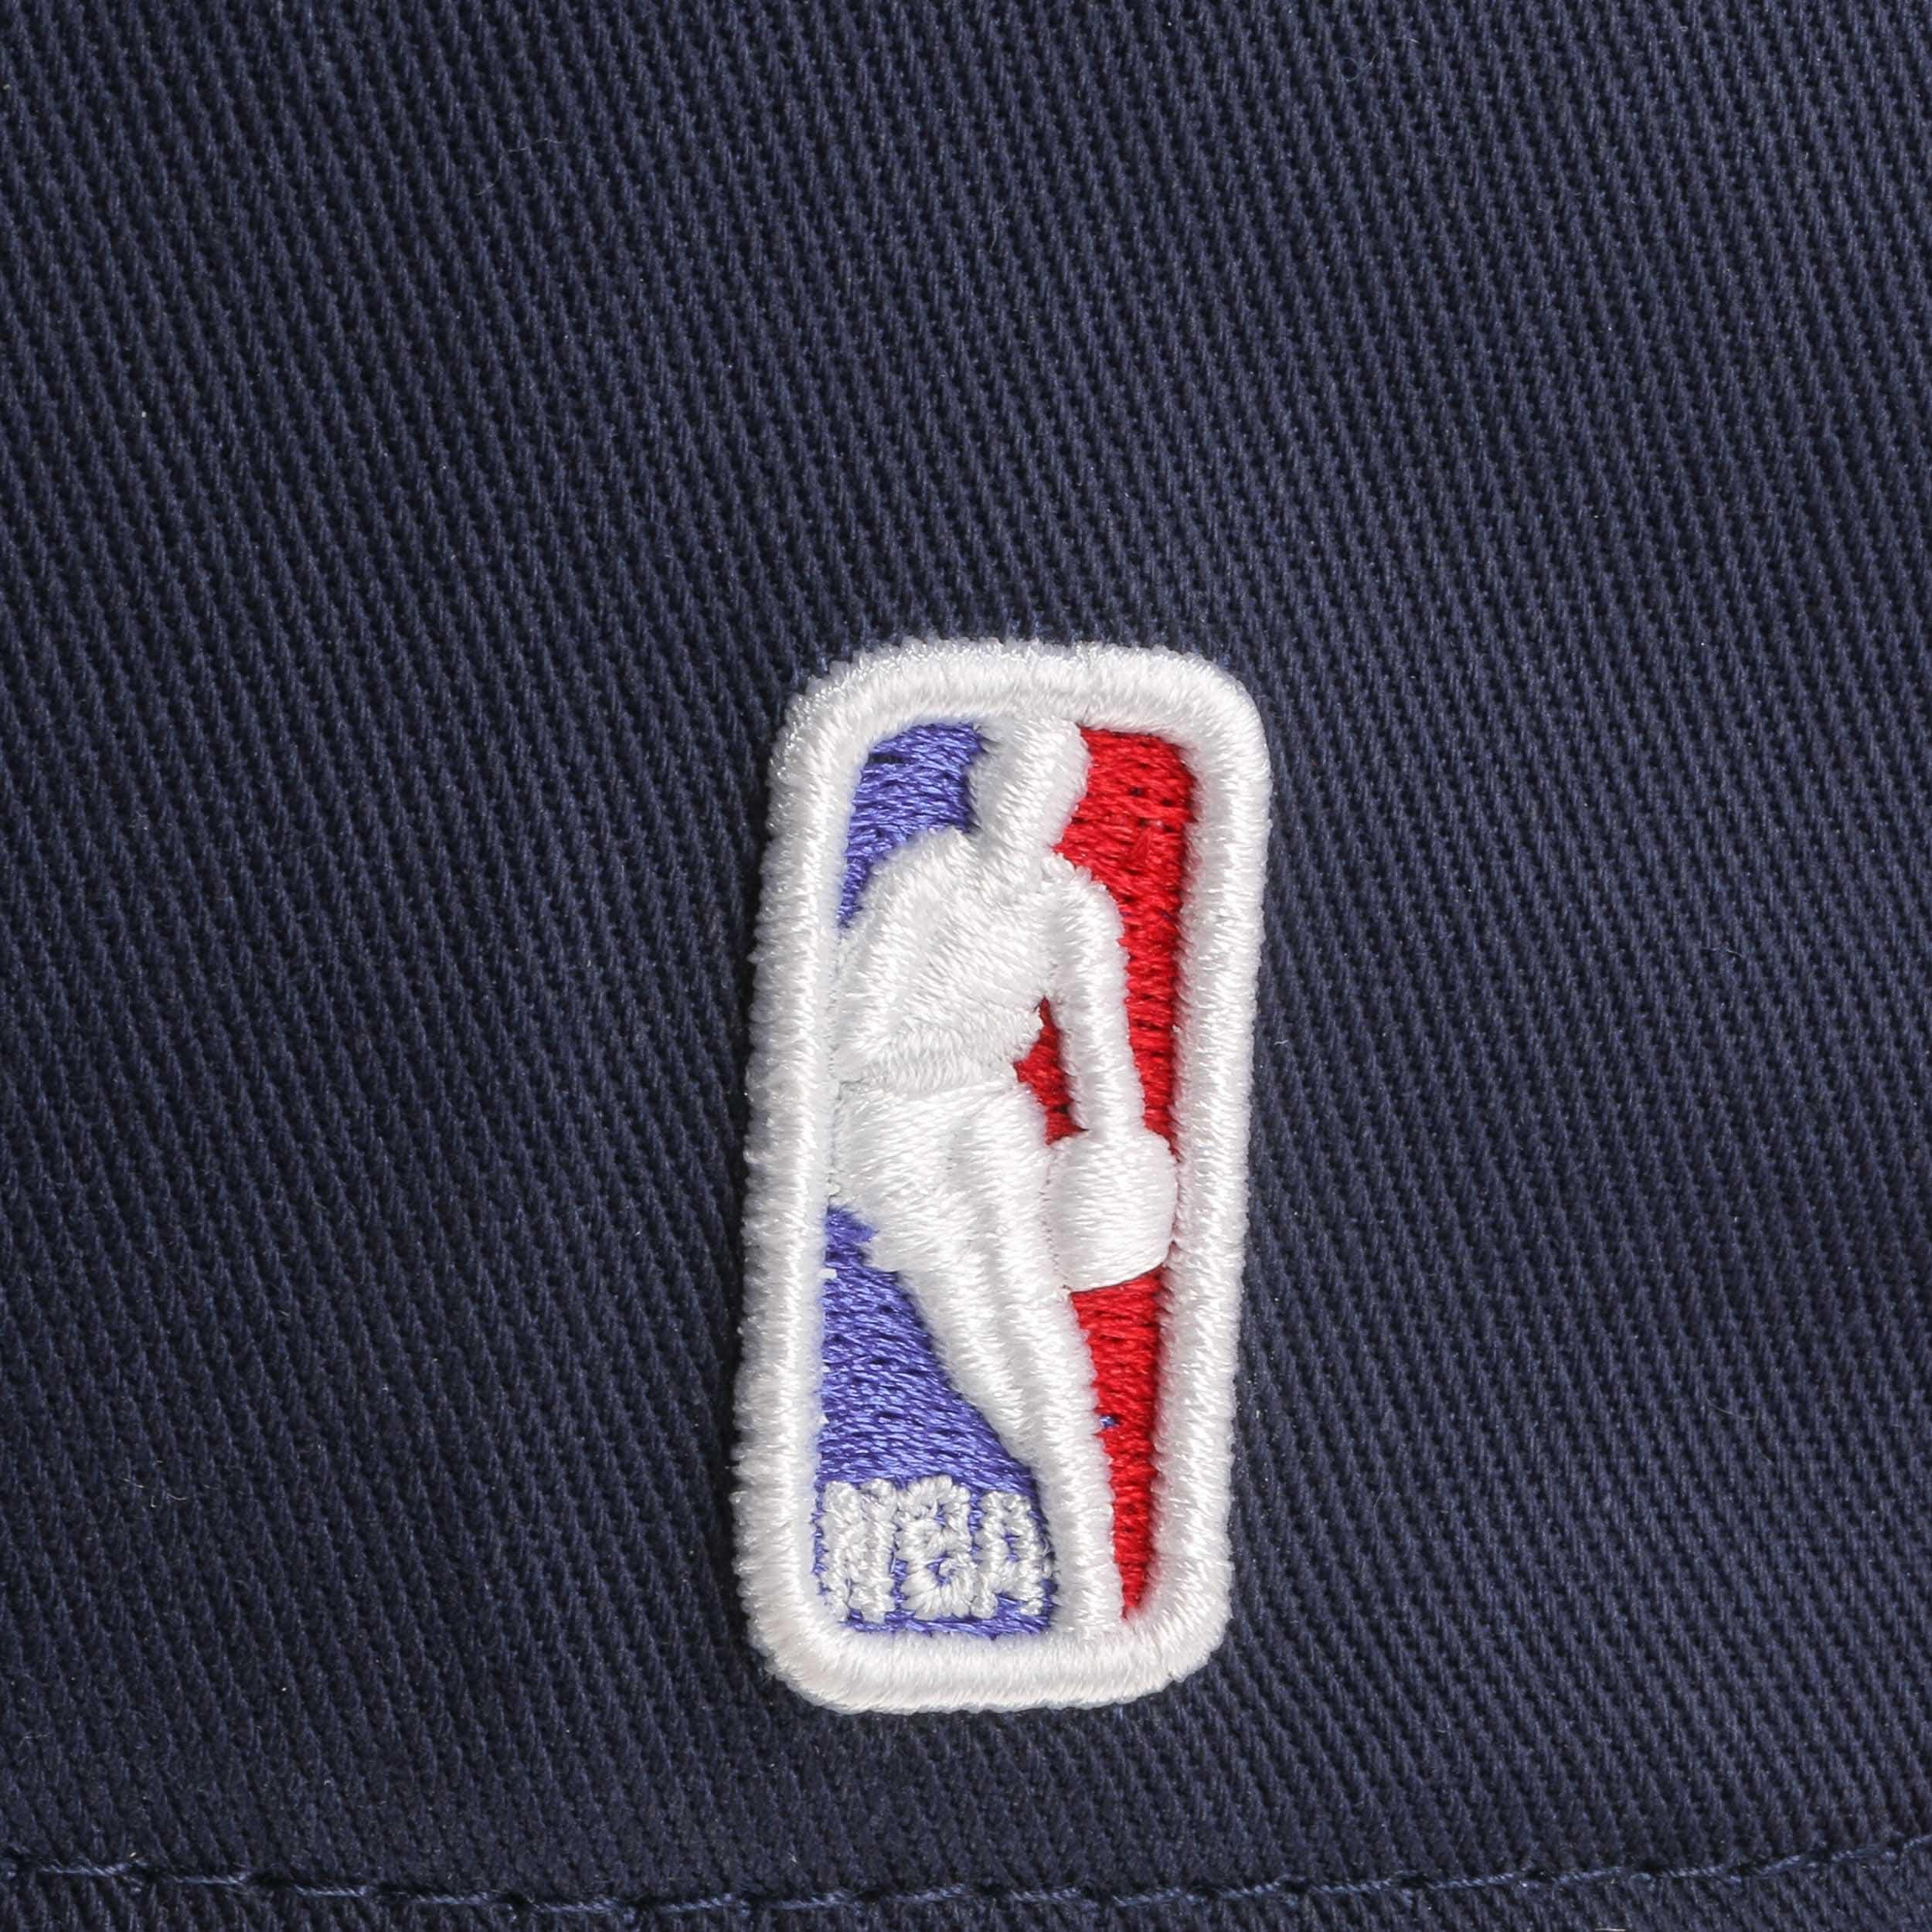 ... Gorra 9Fifty OTC Pelicans by New Era - azul oscuro 6 ... 38a7553349d